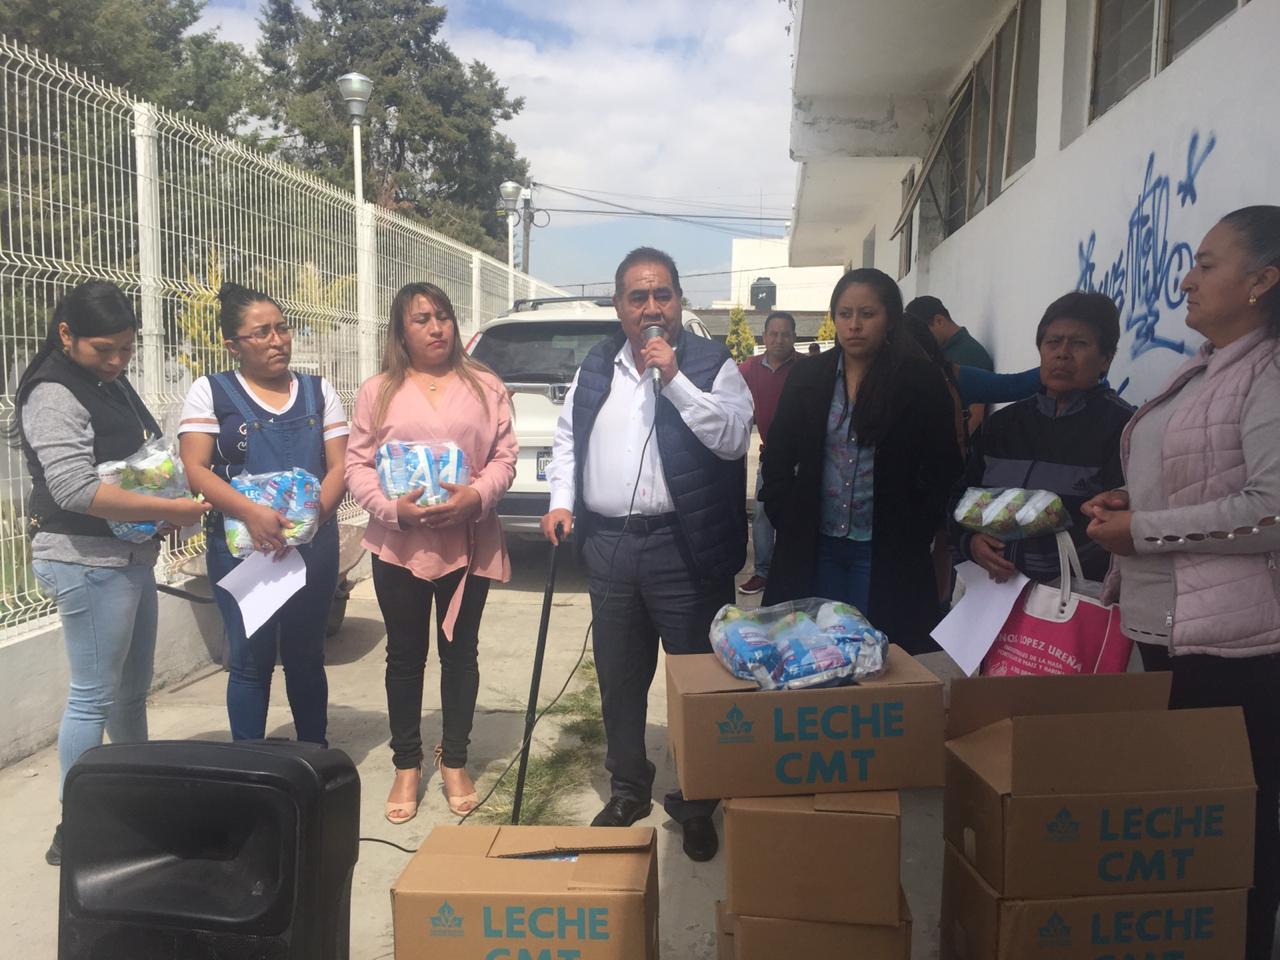 Estafadores intentan lucrar con programas sociales en Amozoc